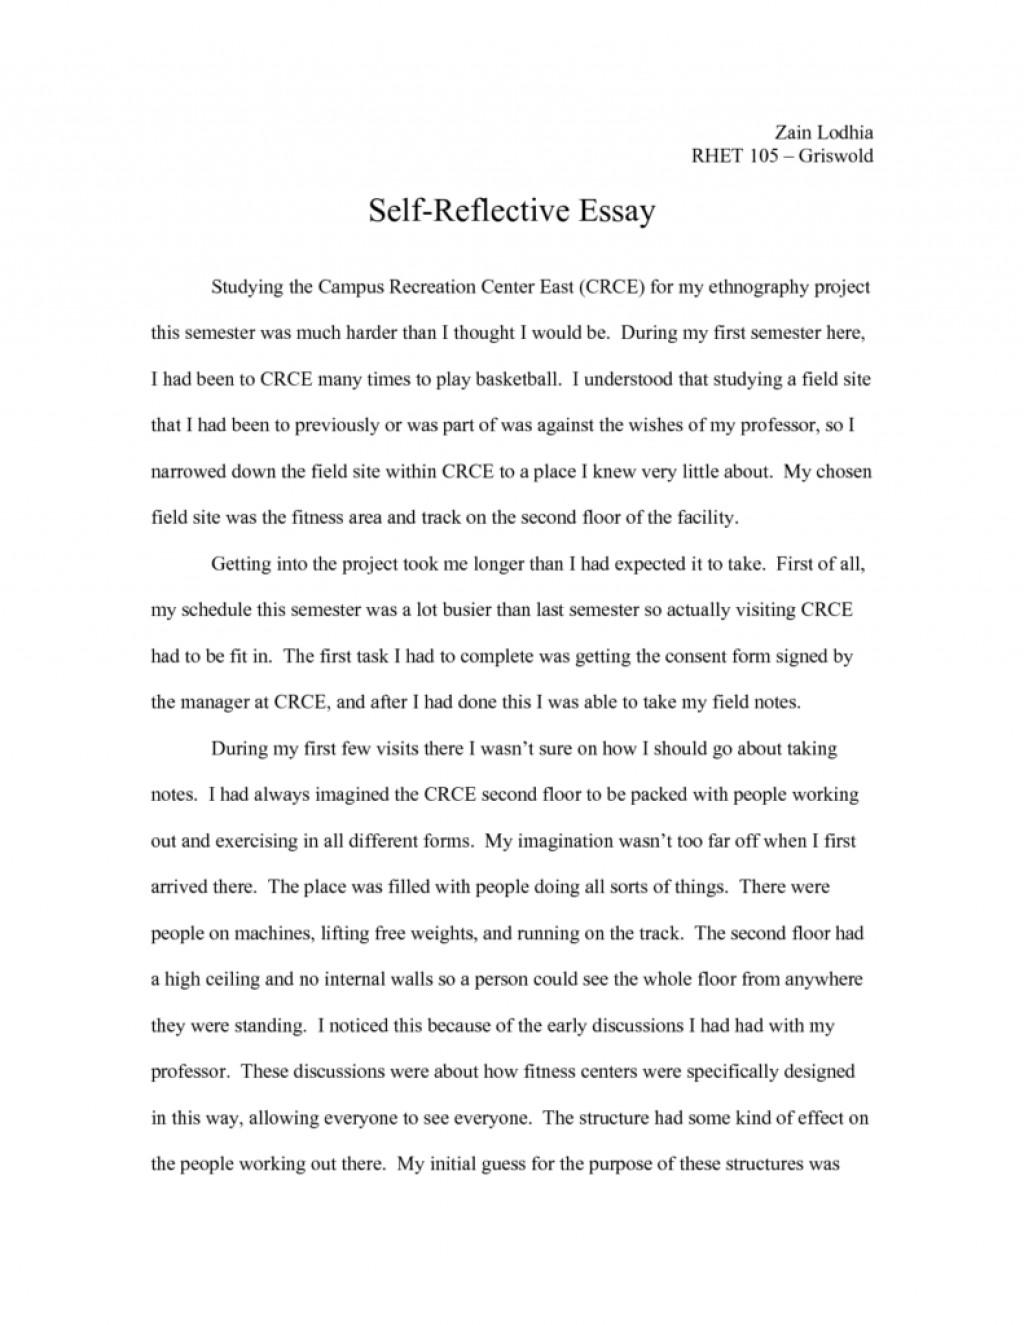 High school senior essay scholarships